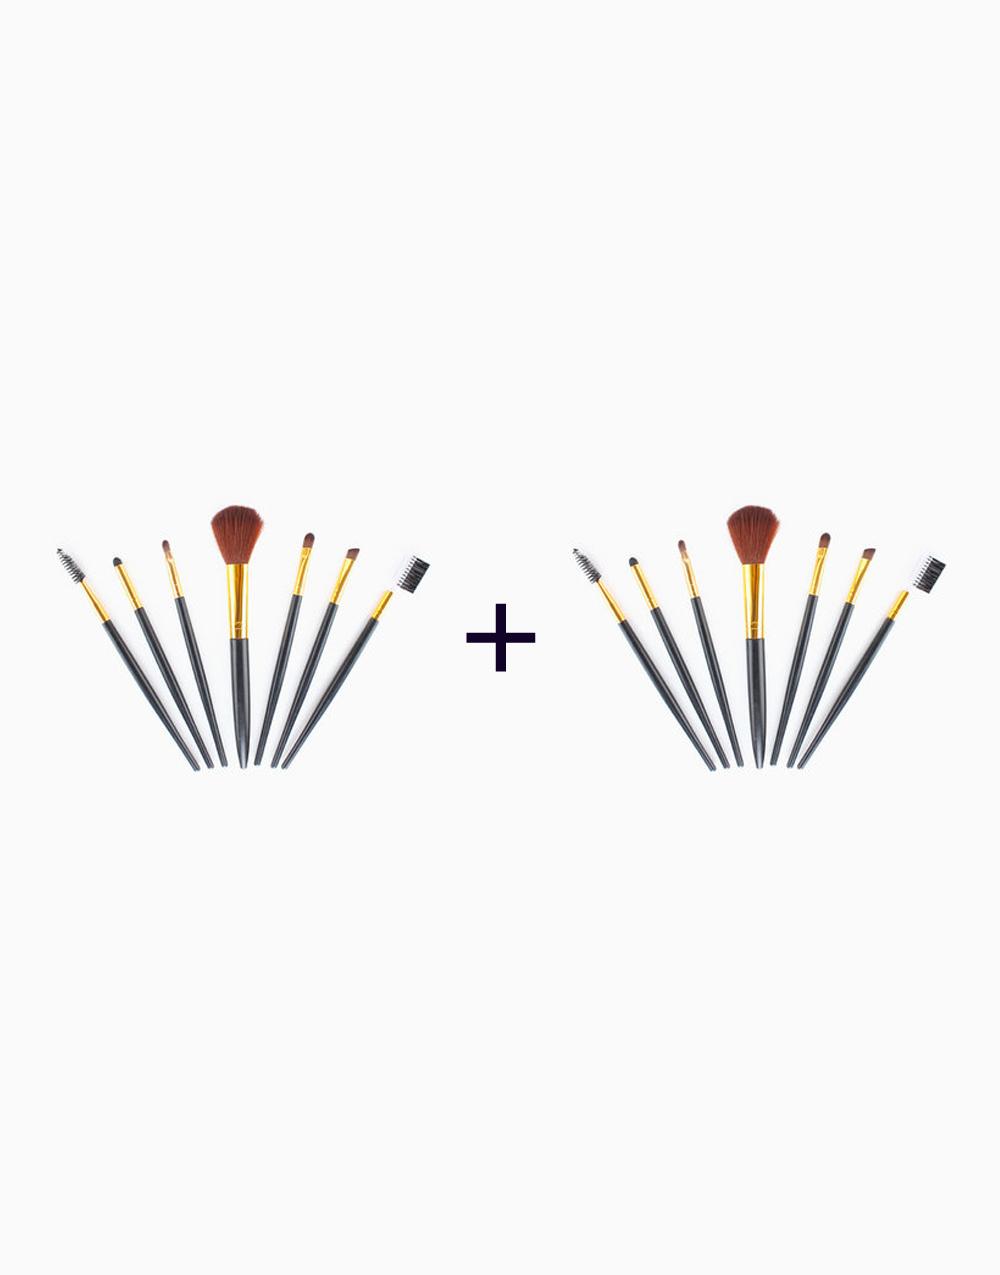 7-Piece Travel Brush Set (Buy 1, Take1) by PRO STUDIO Beauty Exclusives | Black